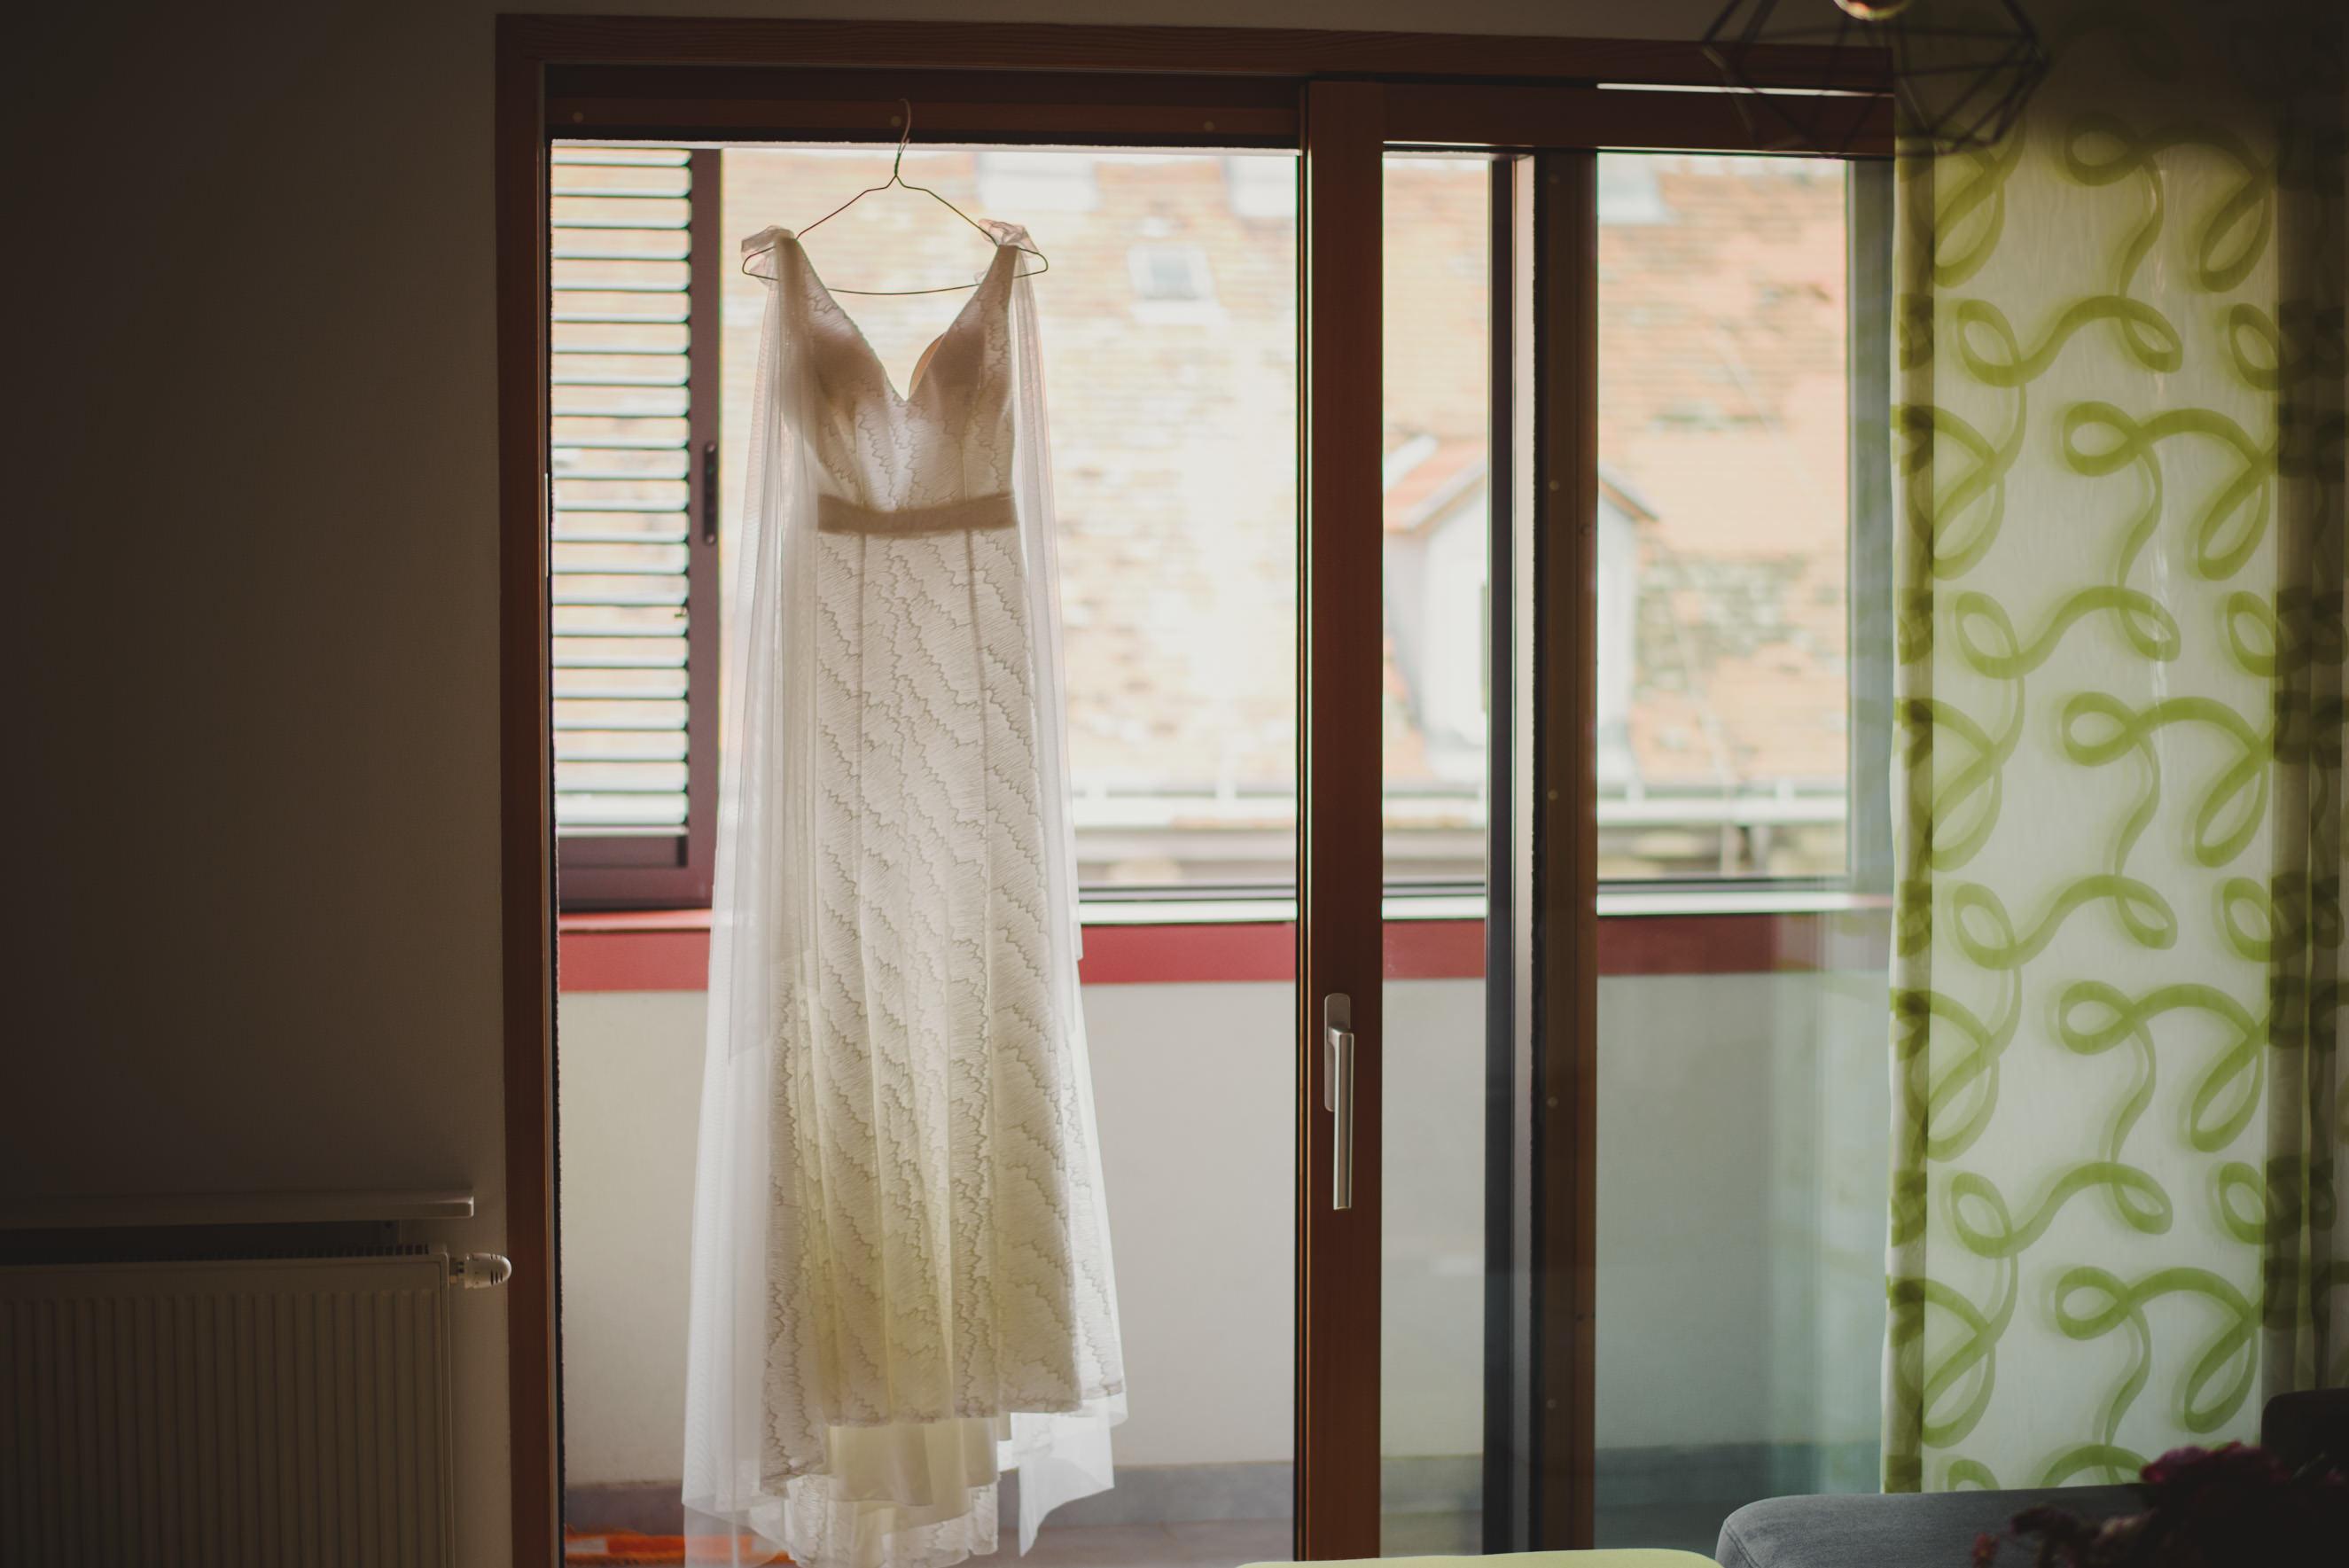 wedding dress hanging in the doorway for the balcony